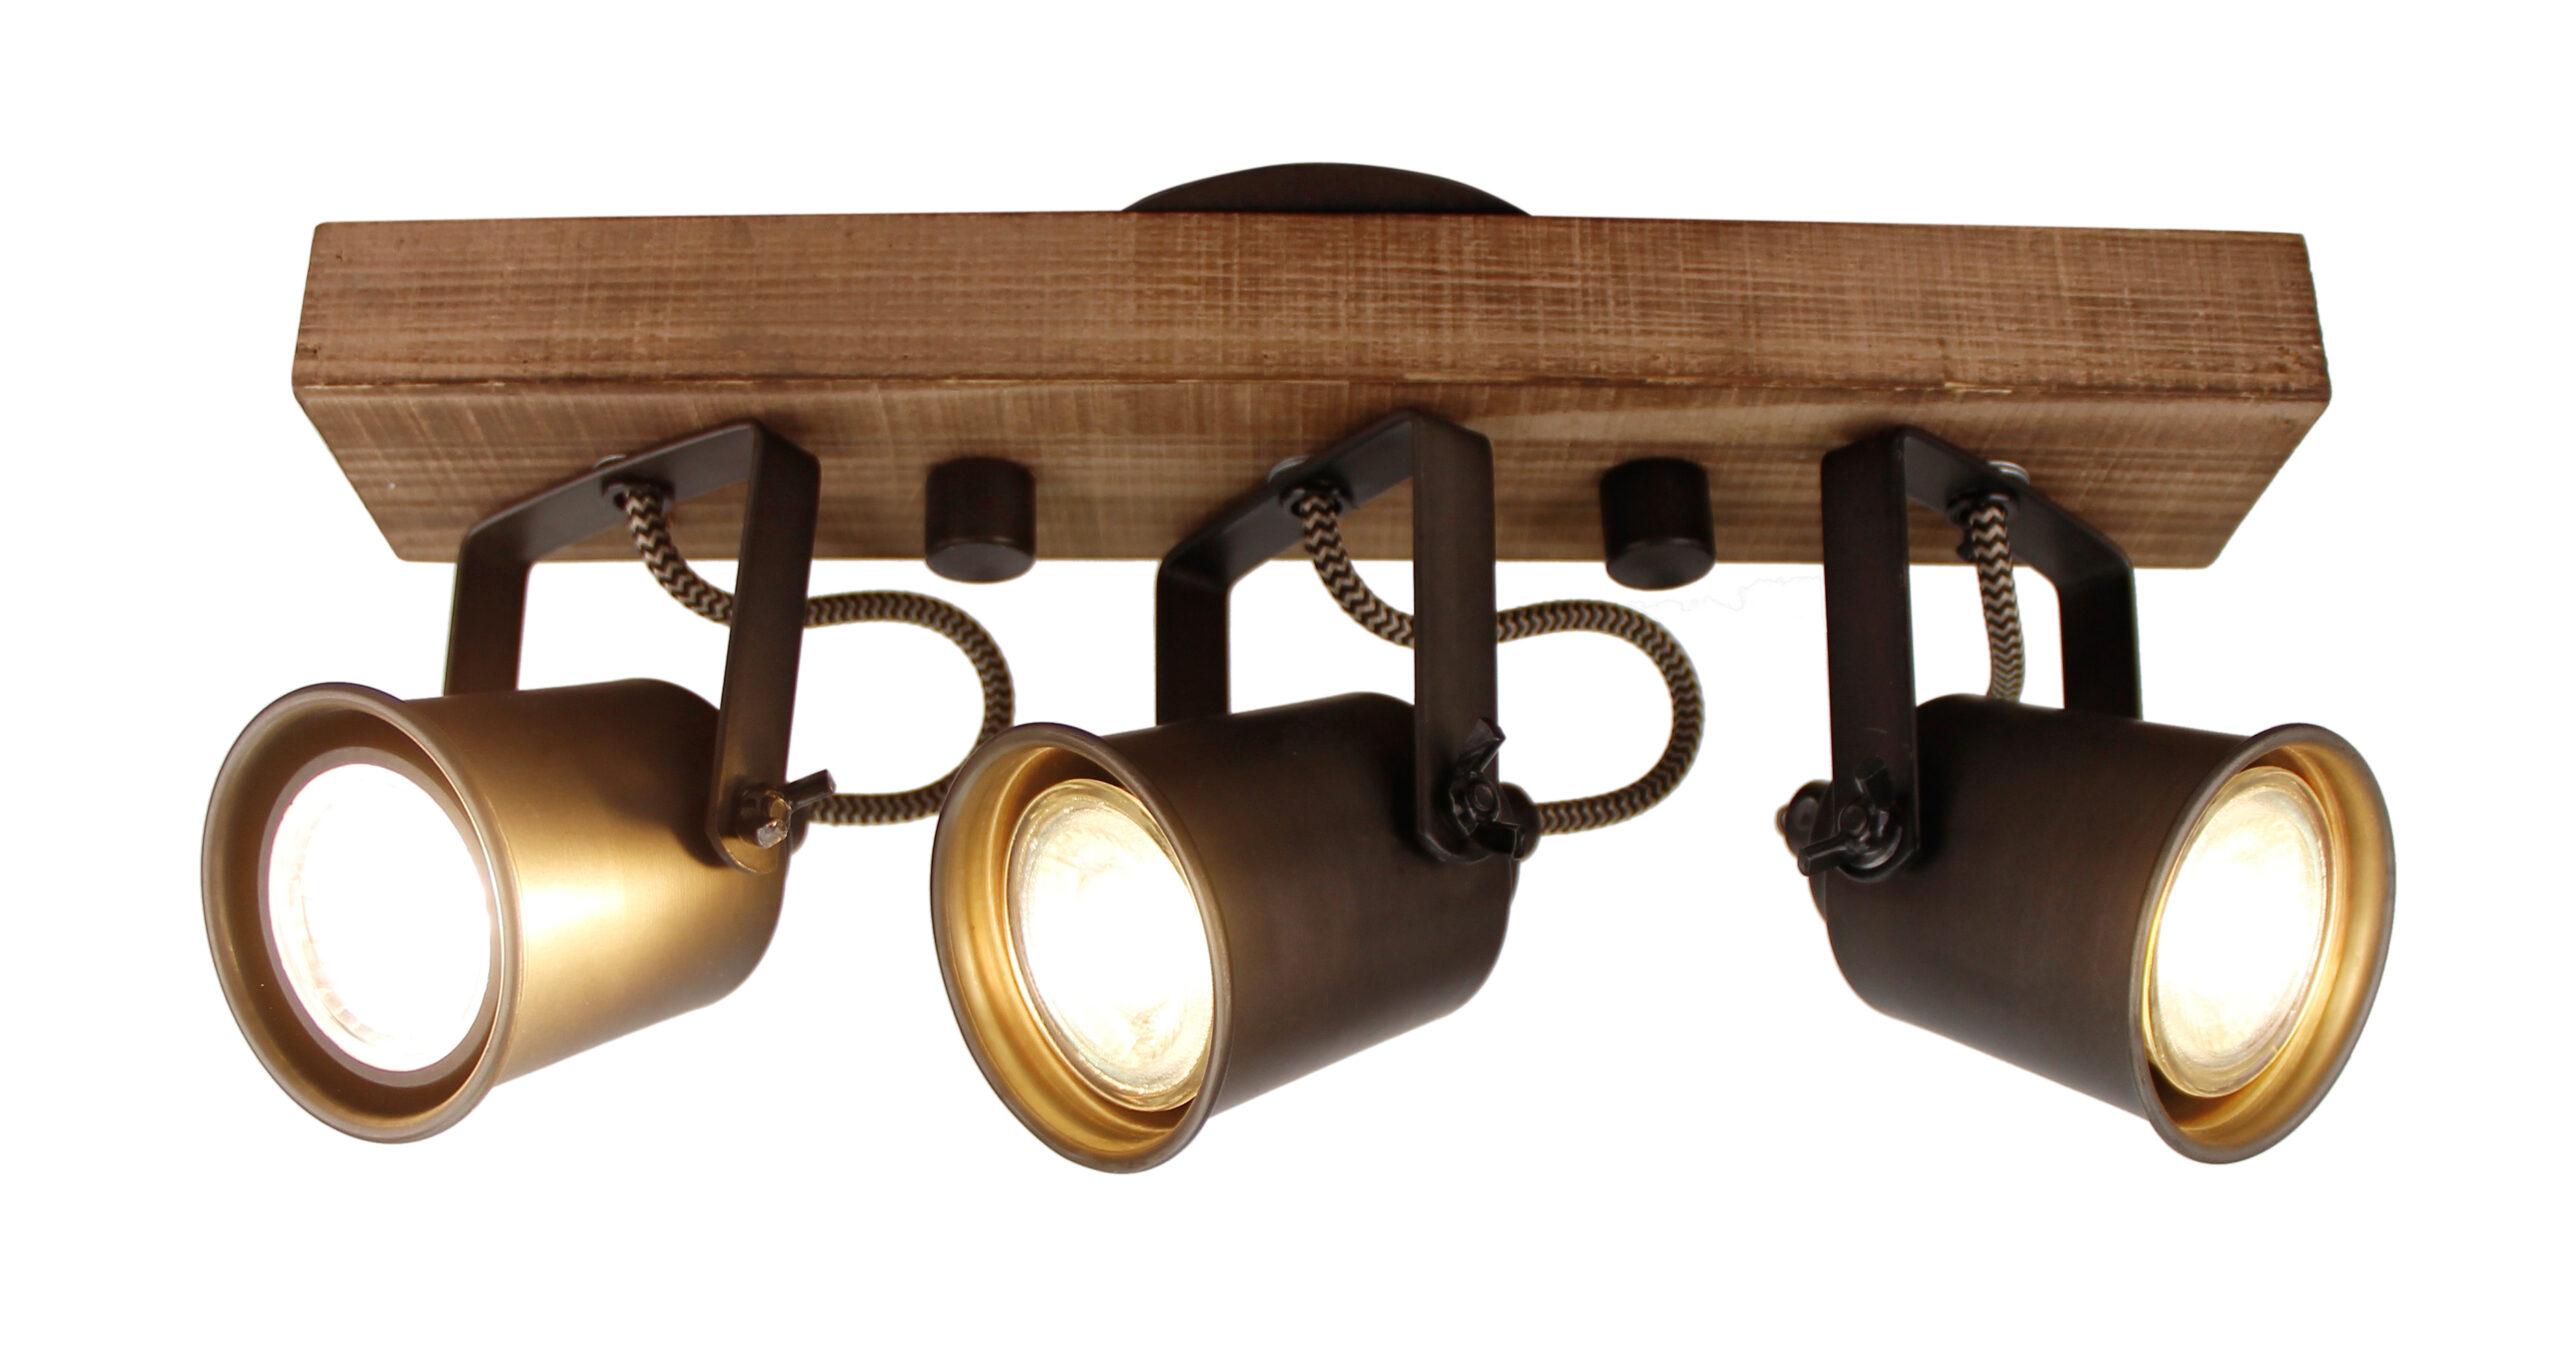 Tazza spot - 3 lichts - zwart black steel met vintage hout